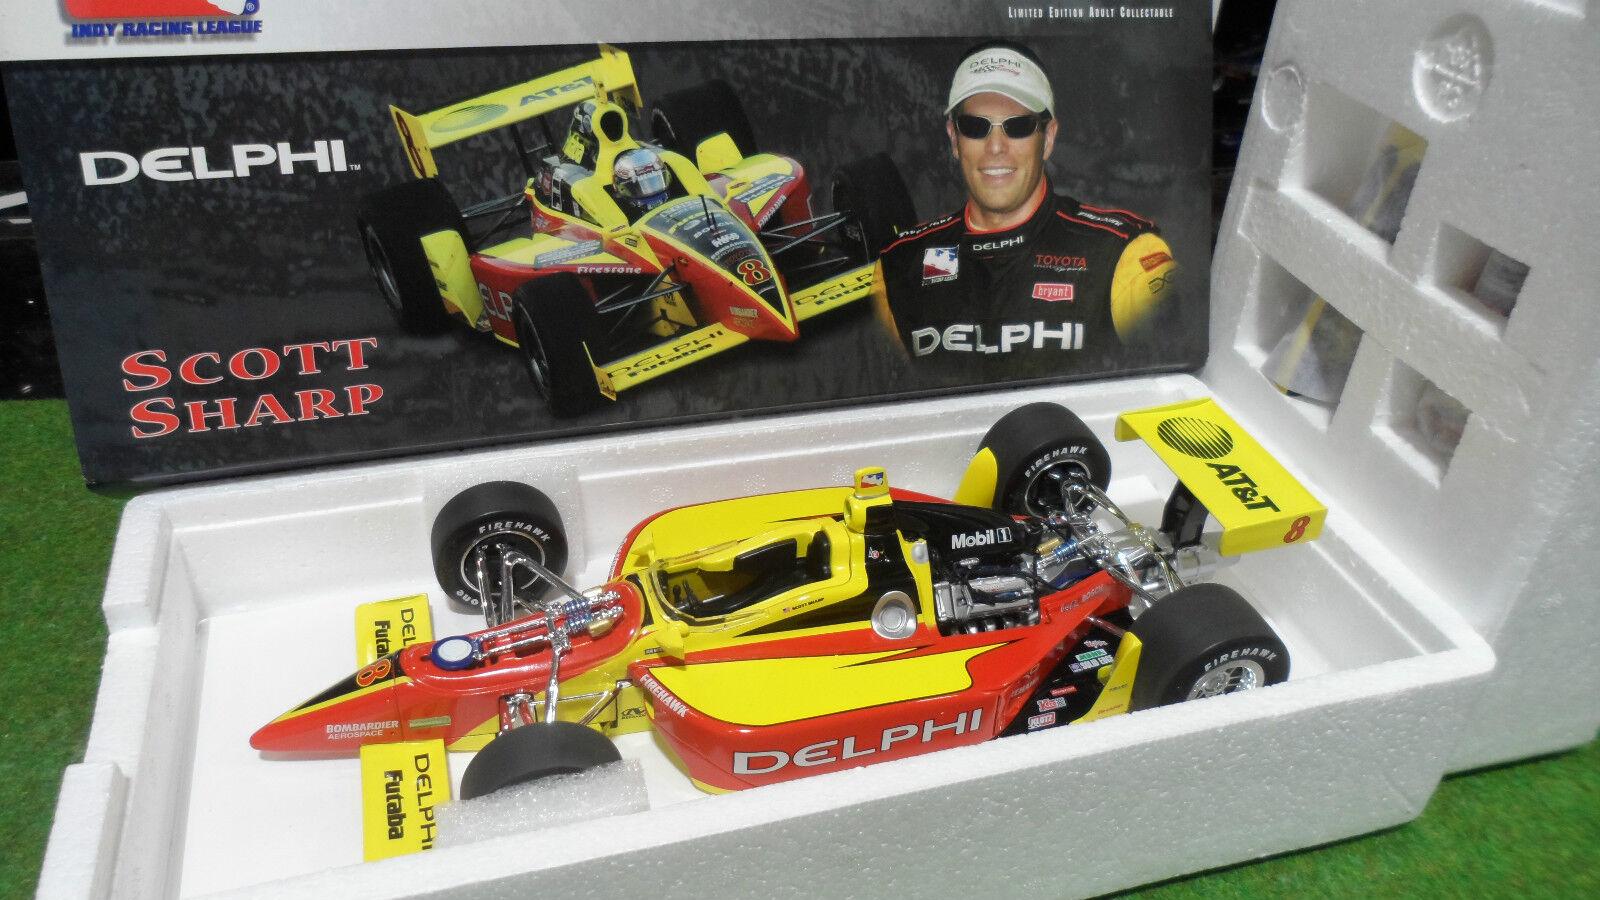 F1 INDY CAR SCOTT SHARP DELPHI DALLARA  8 Jaune au 1 18 ACTION voiture miniature